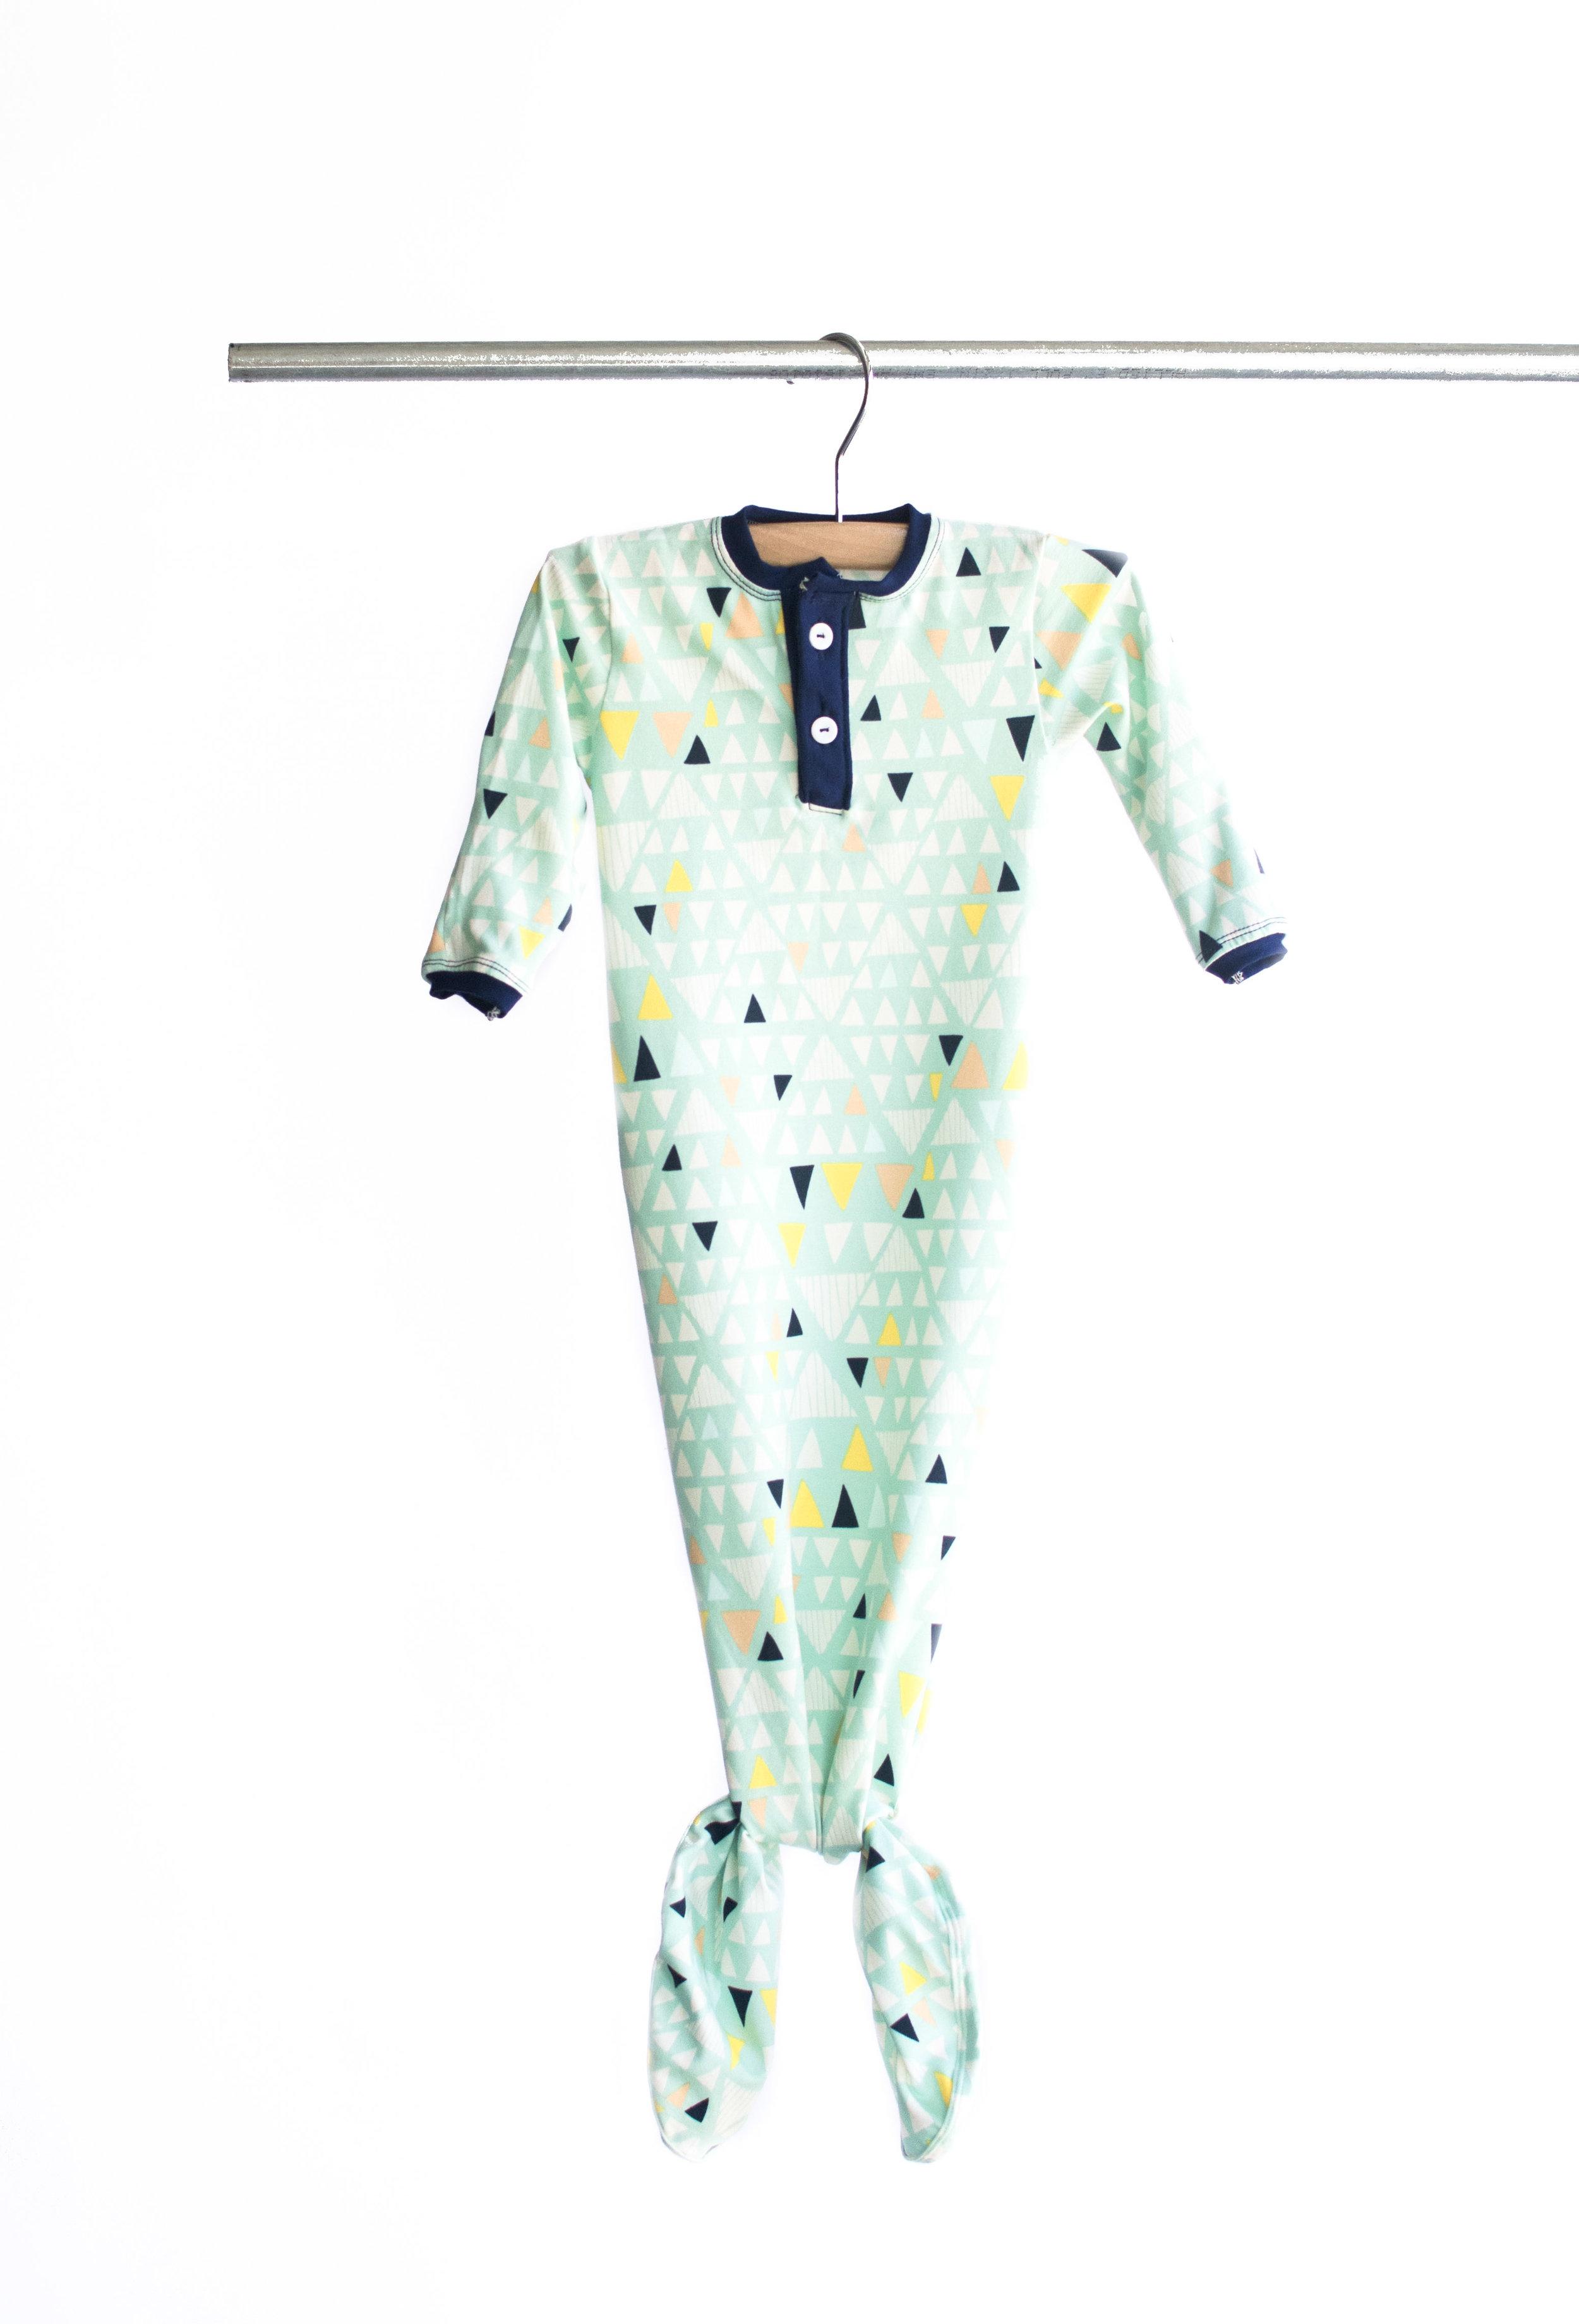 gown10.jpg